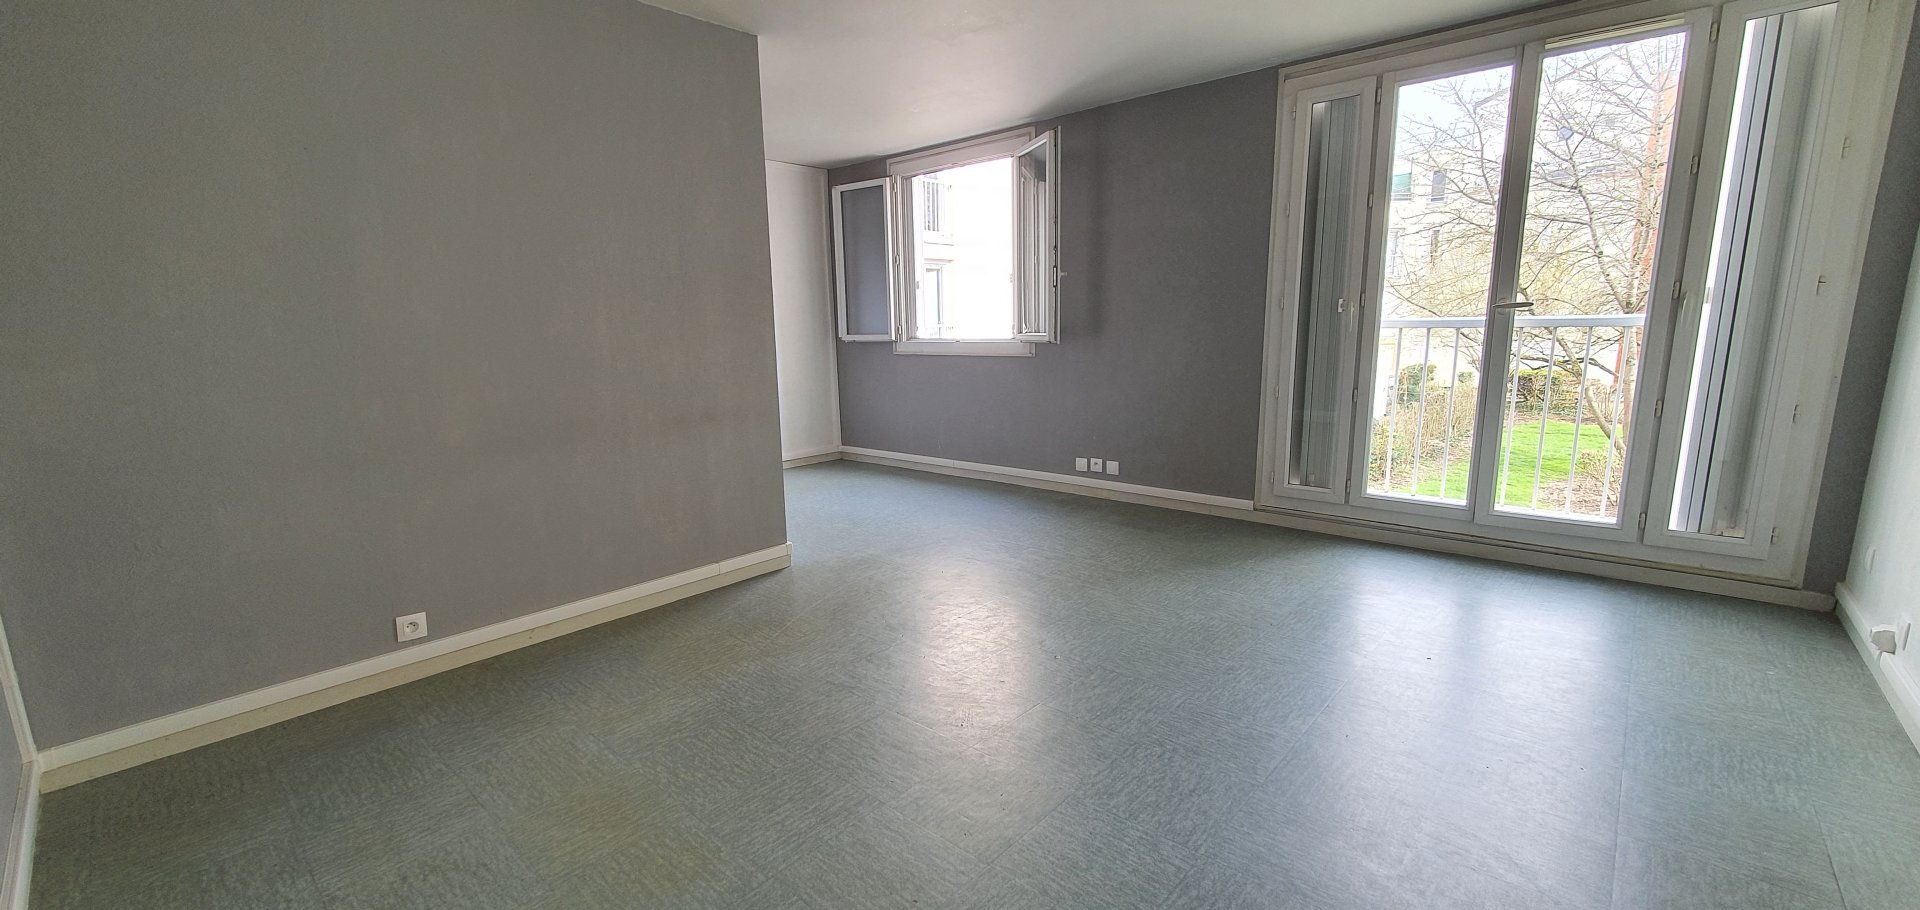 Appartement 3 pièces Coulommiers